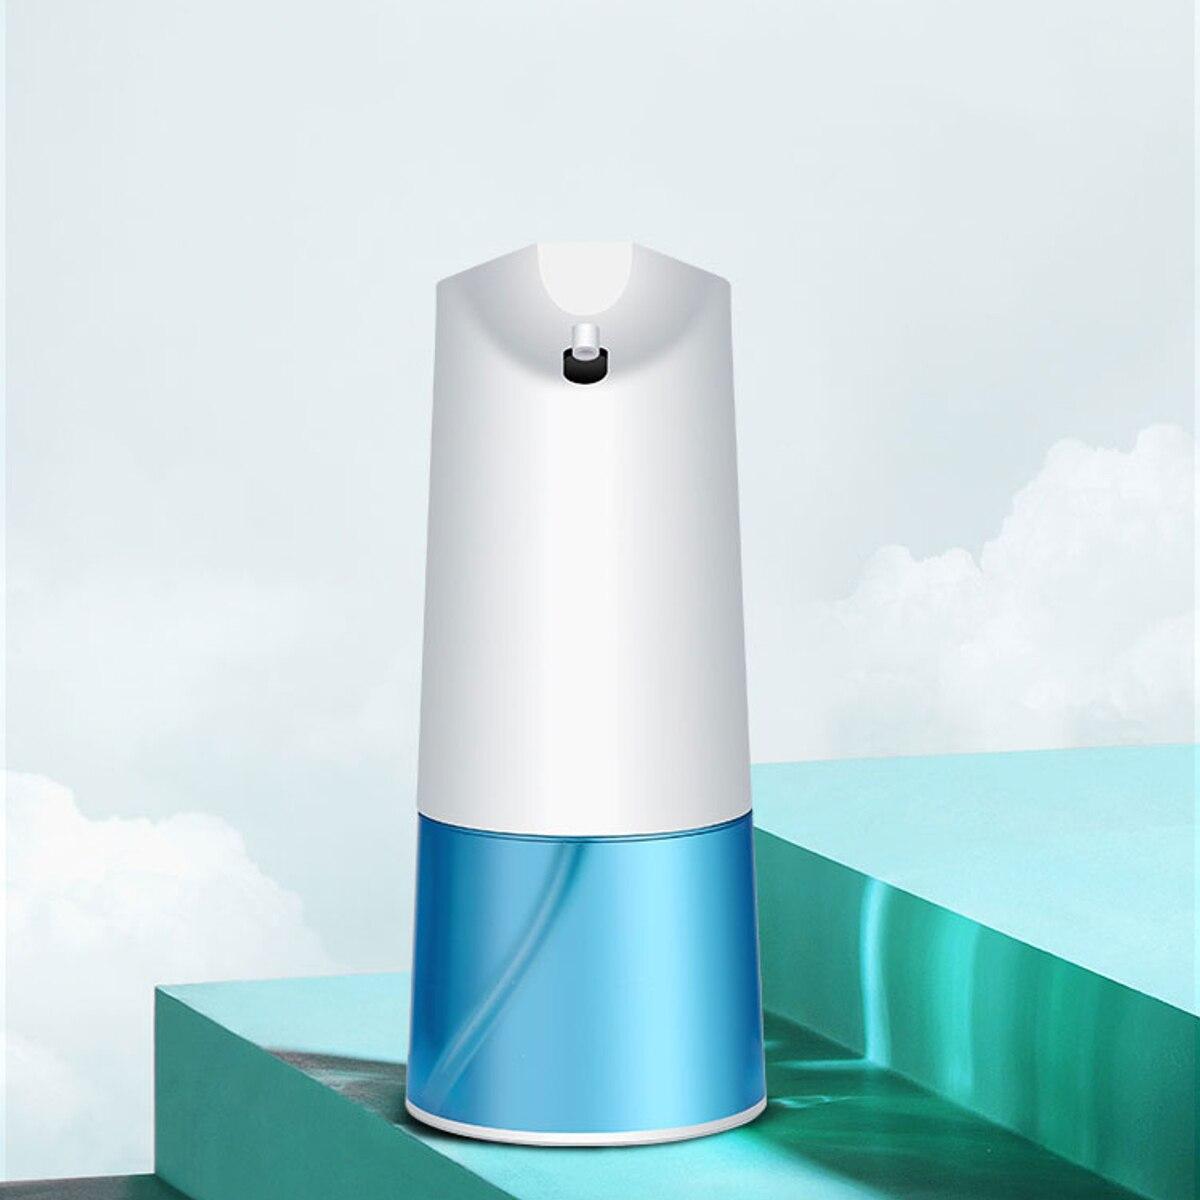 Image 5 - Xiaowei X4 Intelligent Soap Dispenser Automatic Induction Foaming Liquid Shampoo Container PIR Infrared Sensor Hand WashingLiquid Soap Dispensers   -